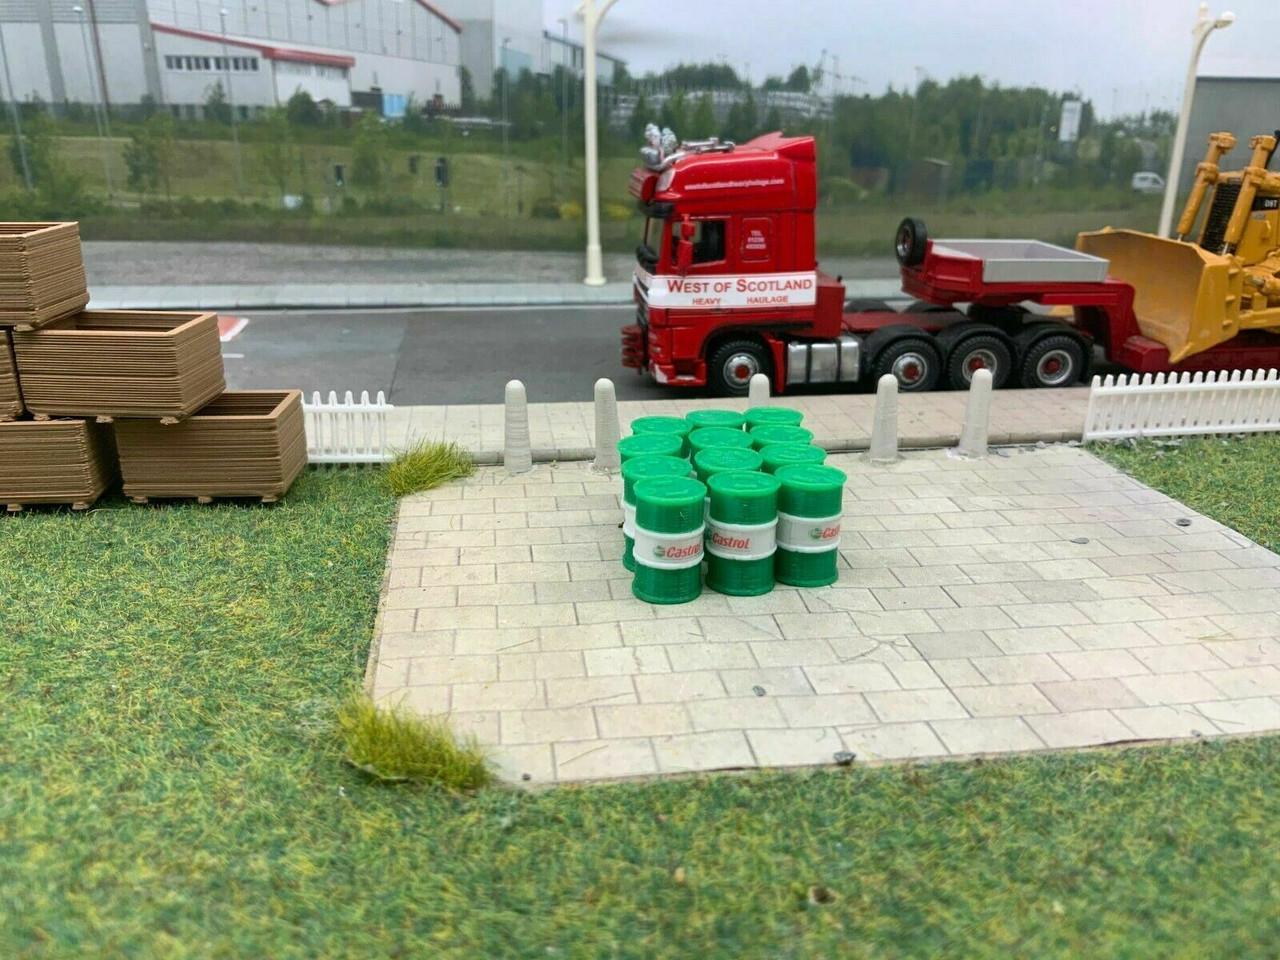 Oil Barrels 1:76 3D Printed Green & White - 12pkt